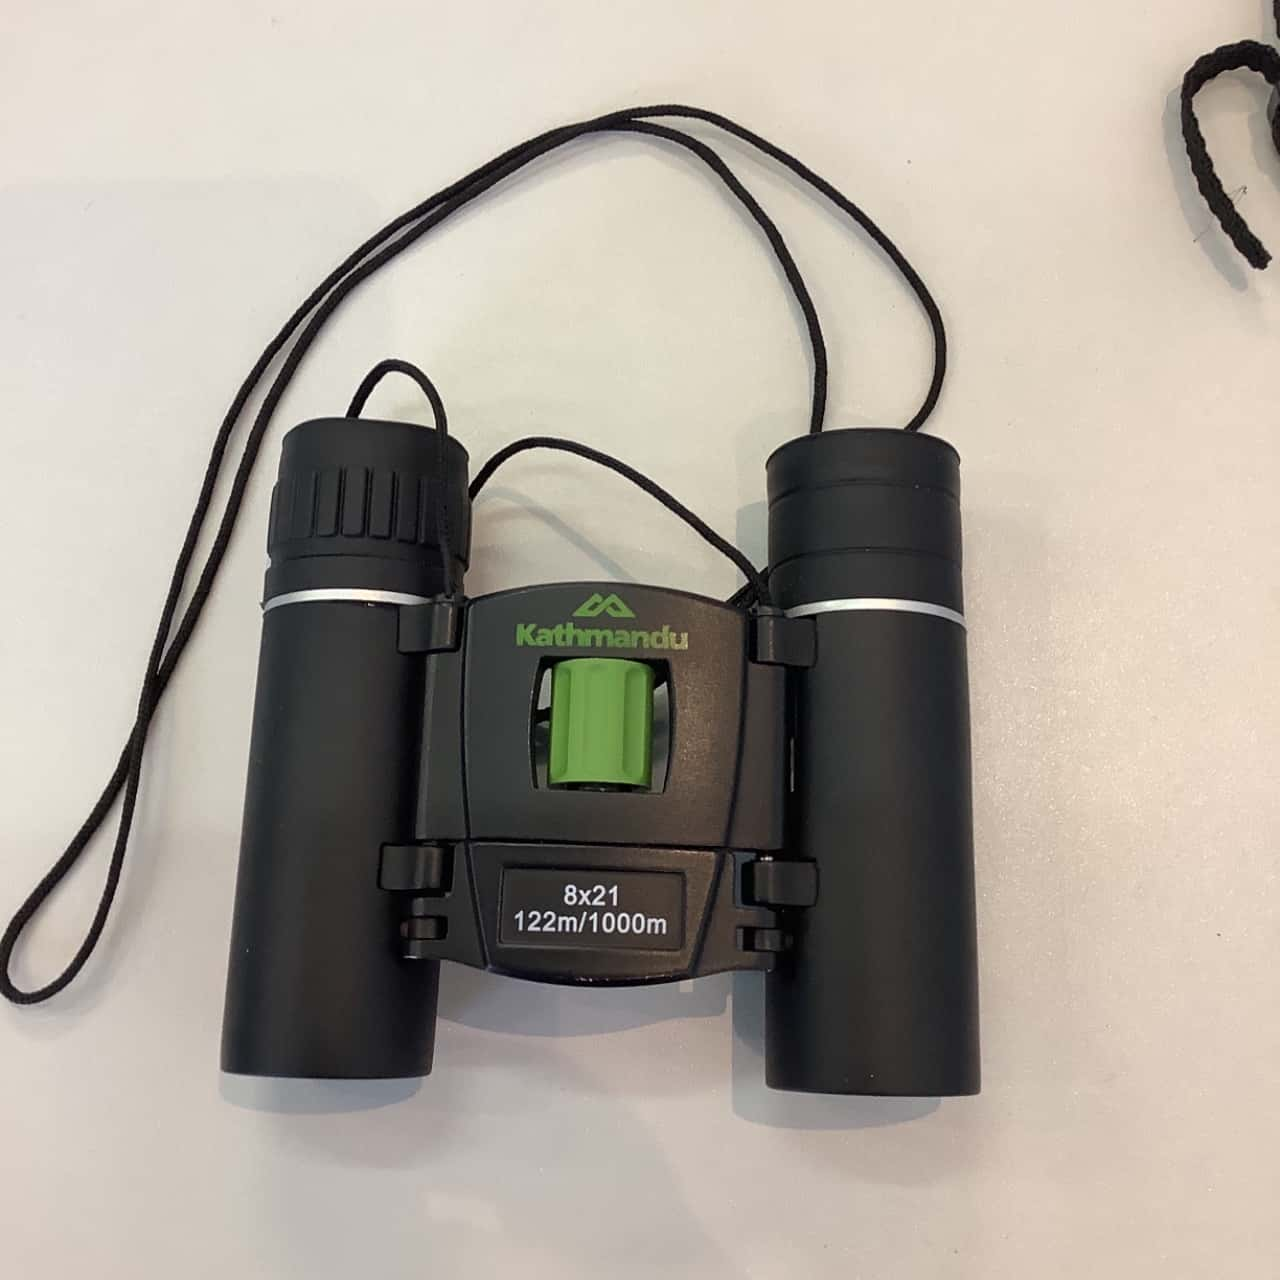 Kathmandu Set of 2 Binoculars - Green and Black